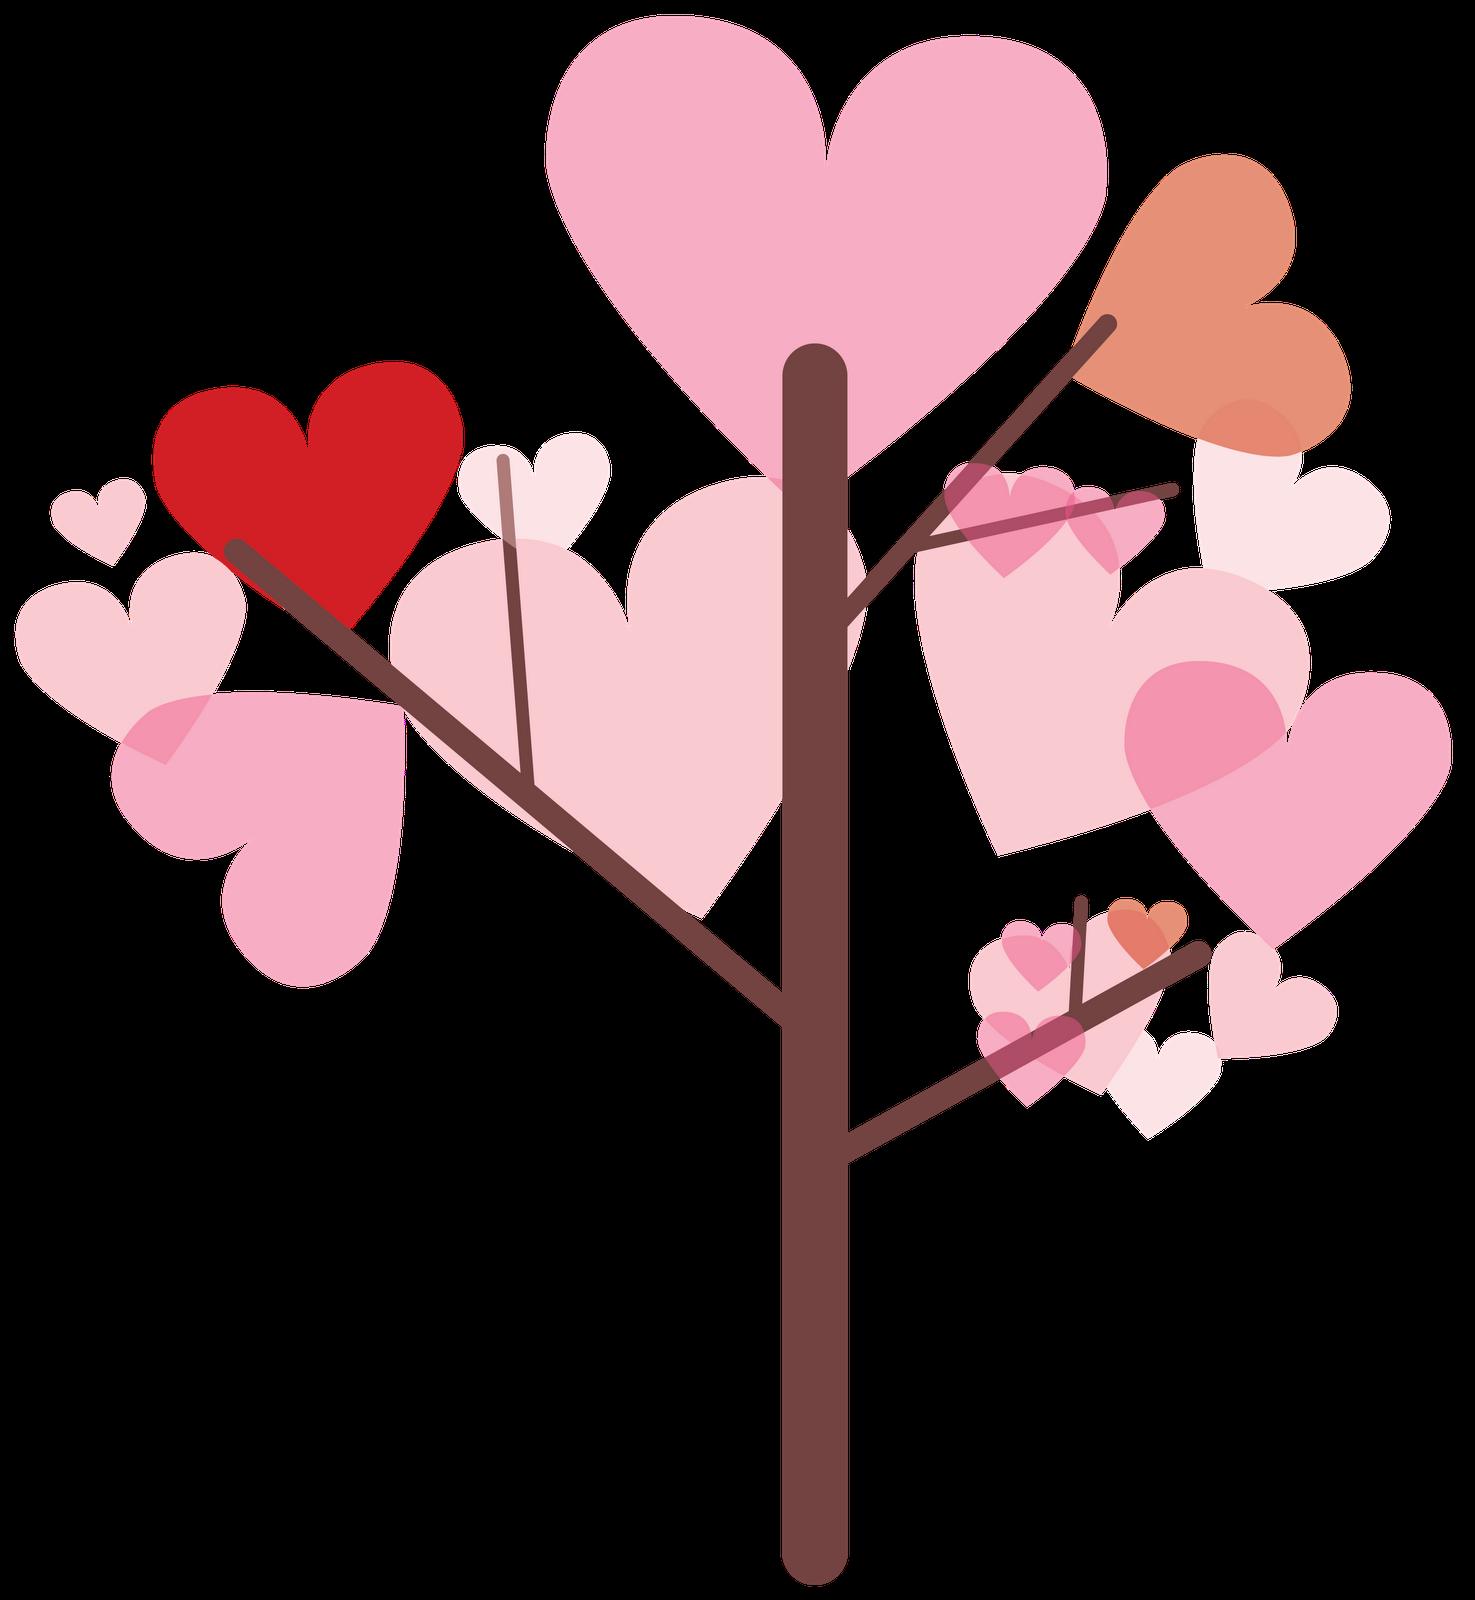 Love cliparts clip black and white download Love Clipart & Love Clip Art Images - ClipartALL.com clip black and white download